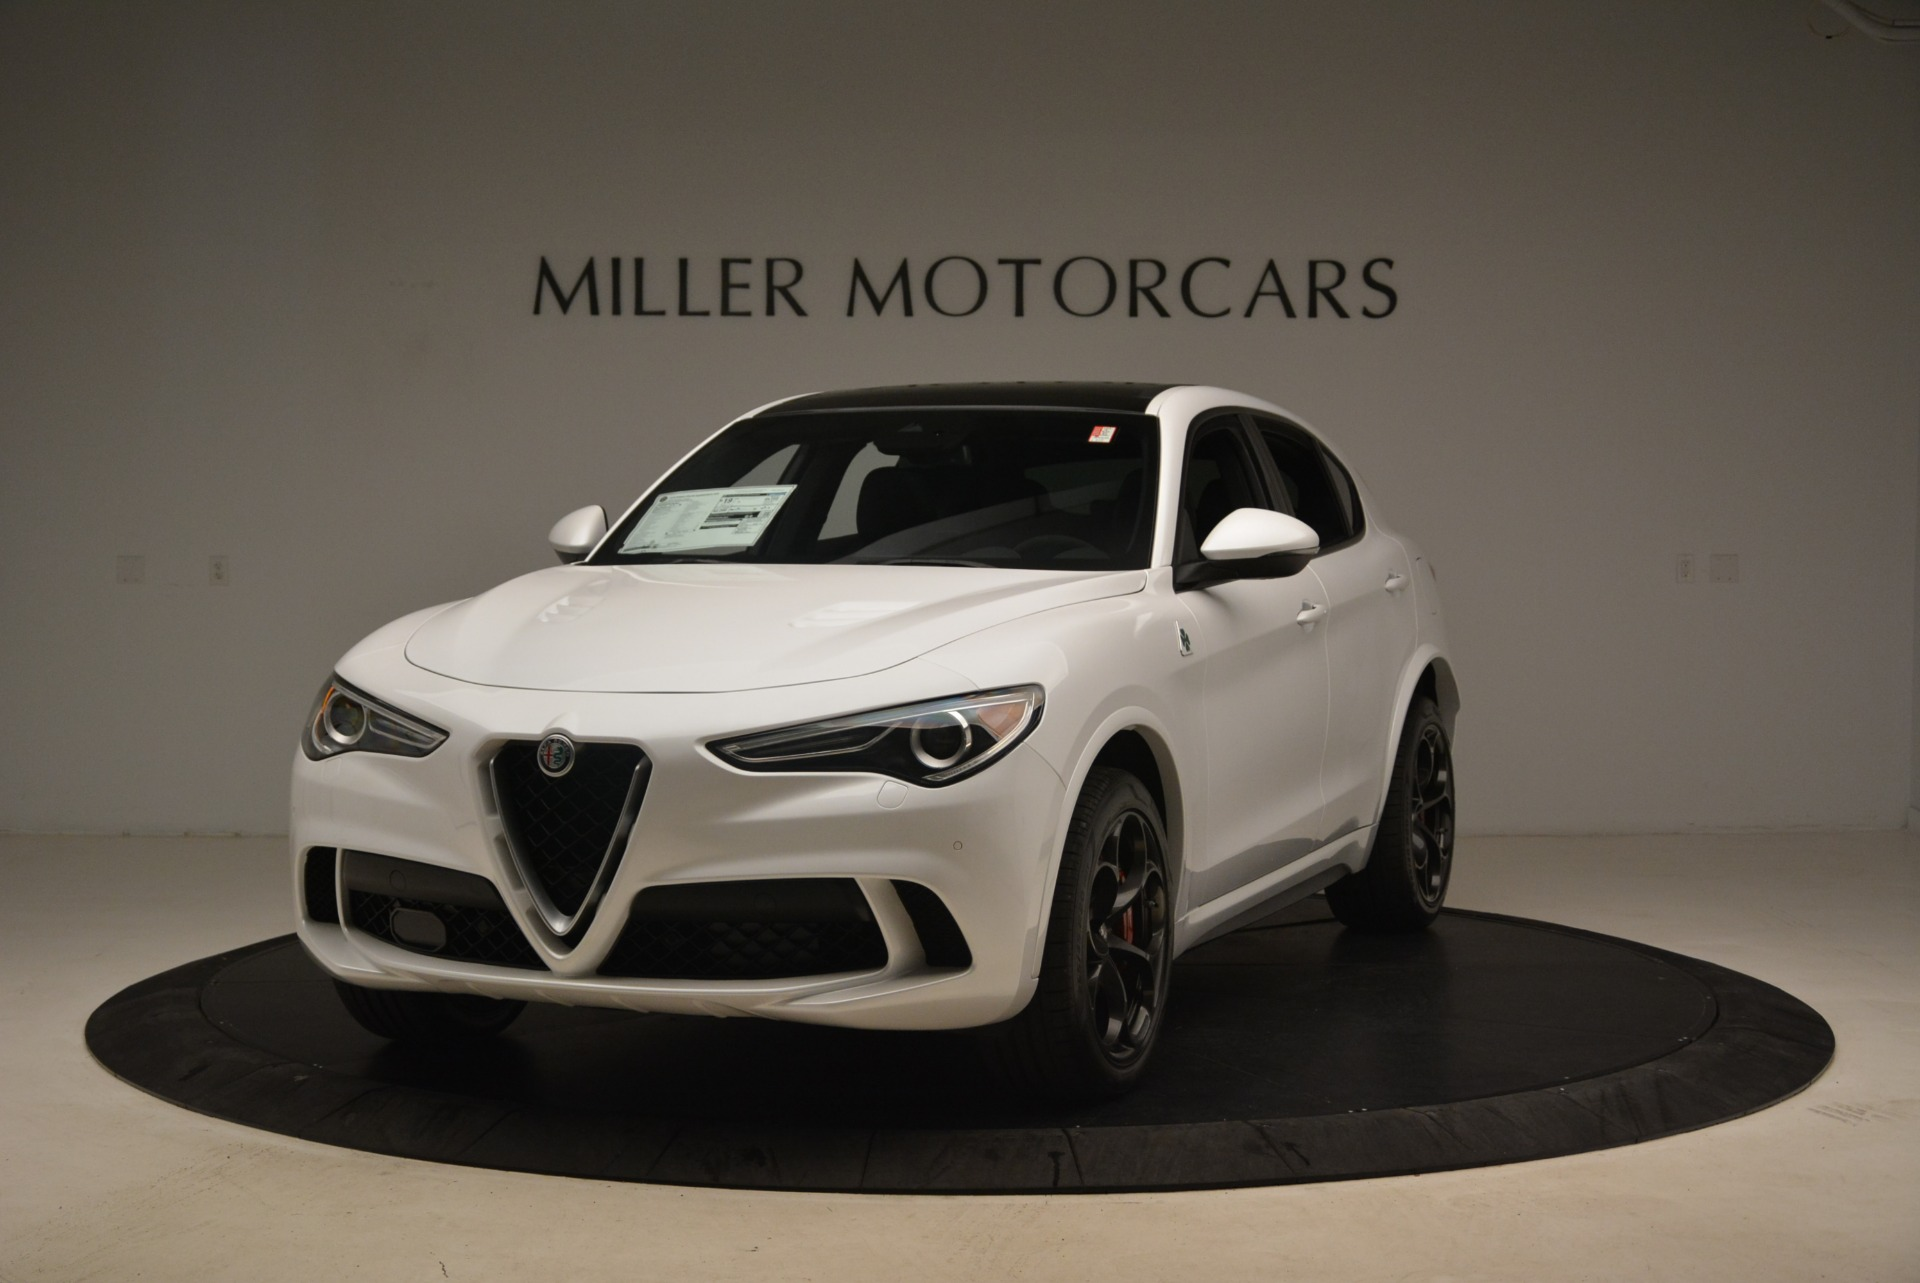 Used 2019 Alfa Romeo Stelvio Quadrifoglio for sale Sold at Rolls-Royce Motor Cars Greenwich in Greenwich CT 06830 1